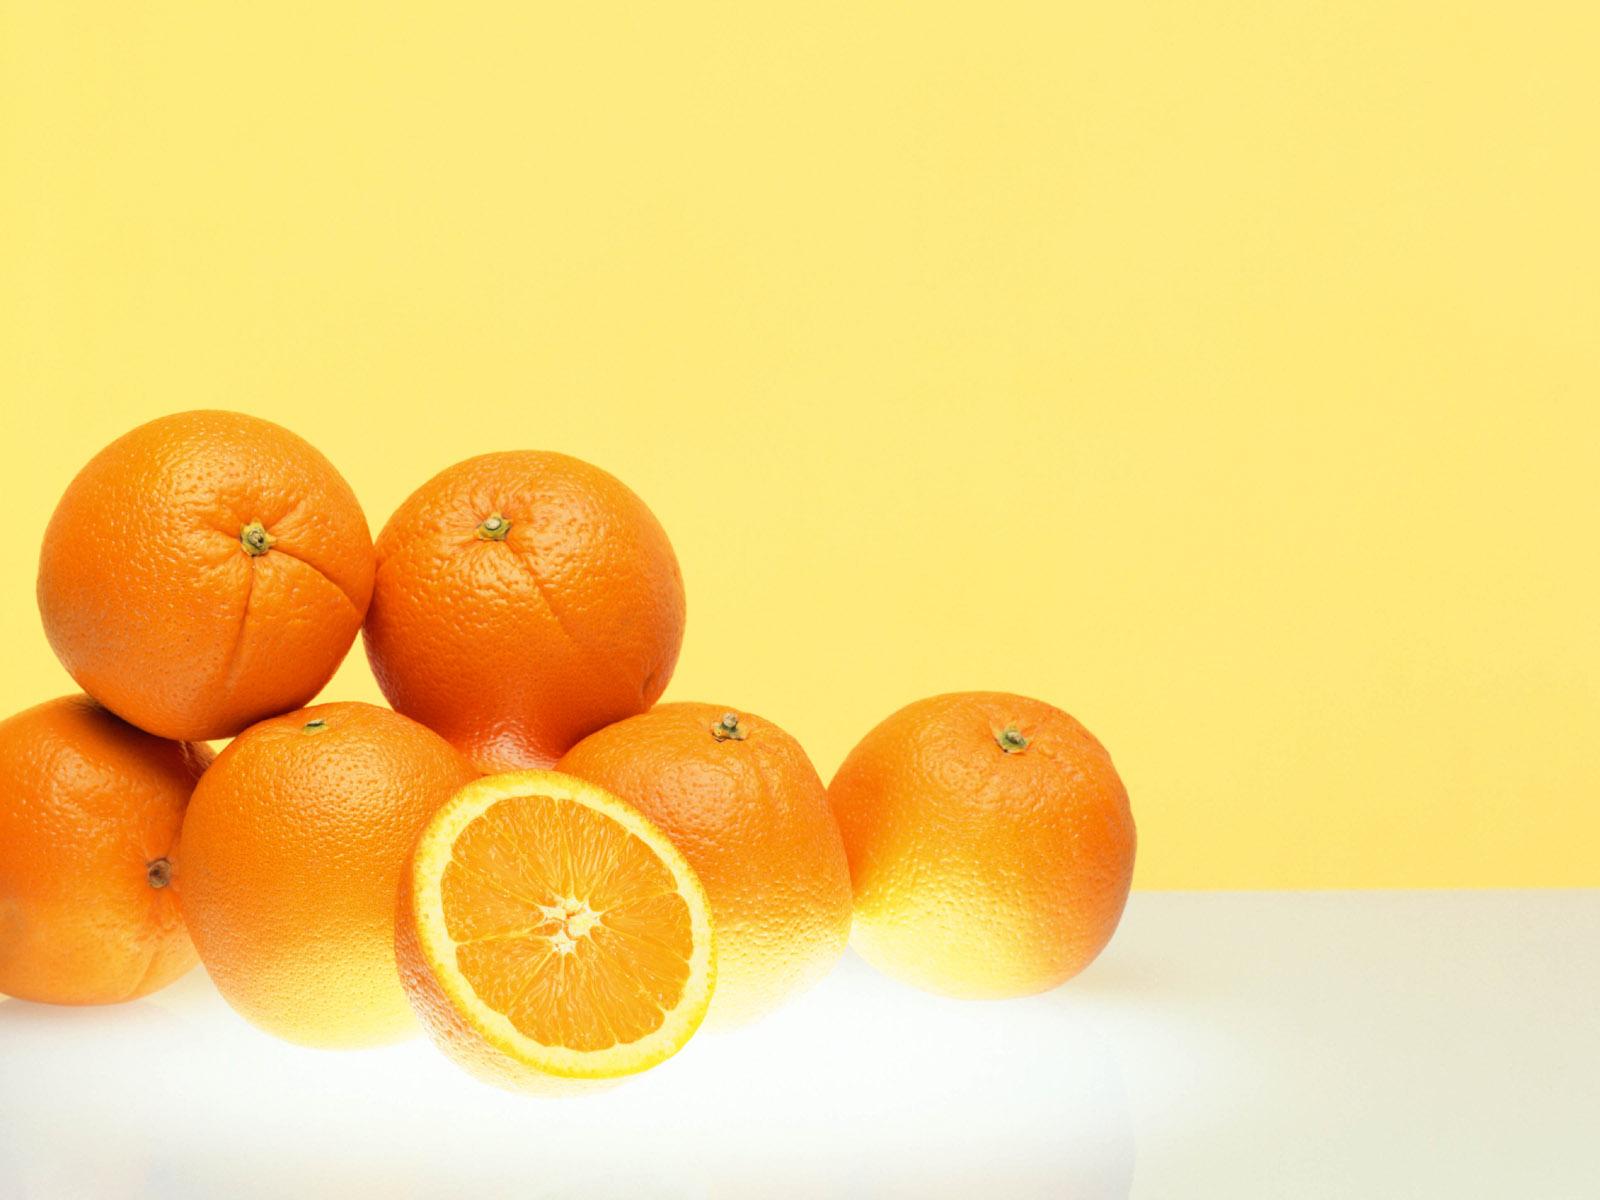 Or orange fruit hd wallpaper - Fruits Wallpapers